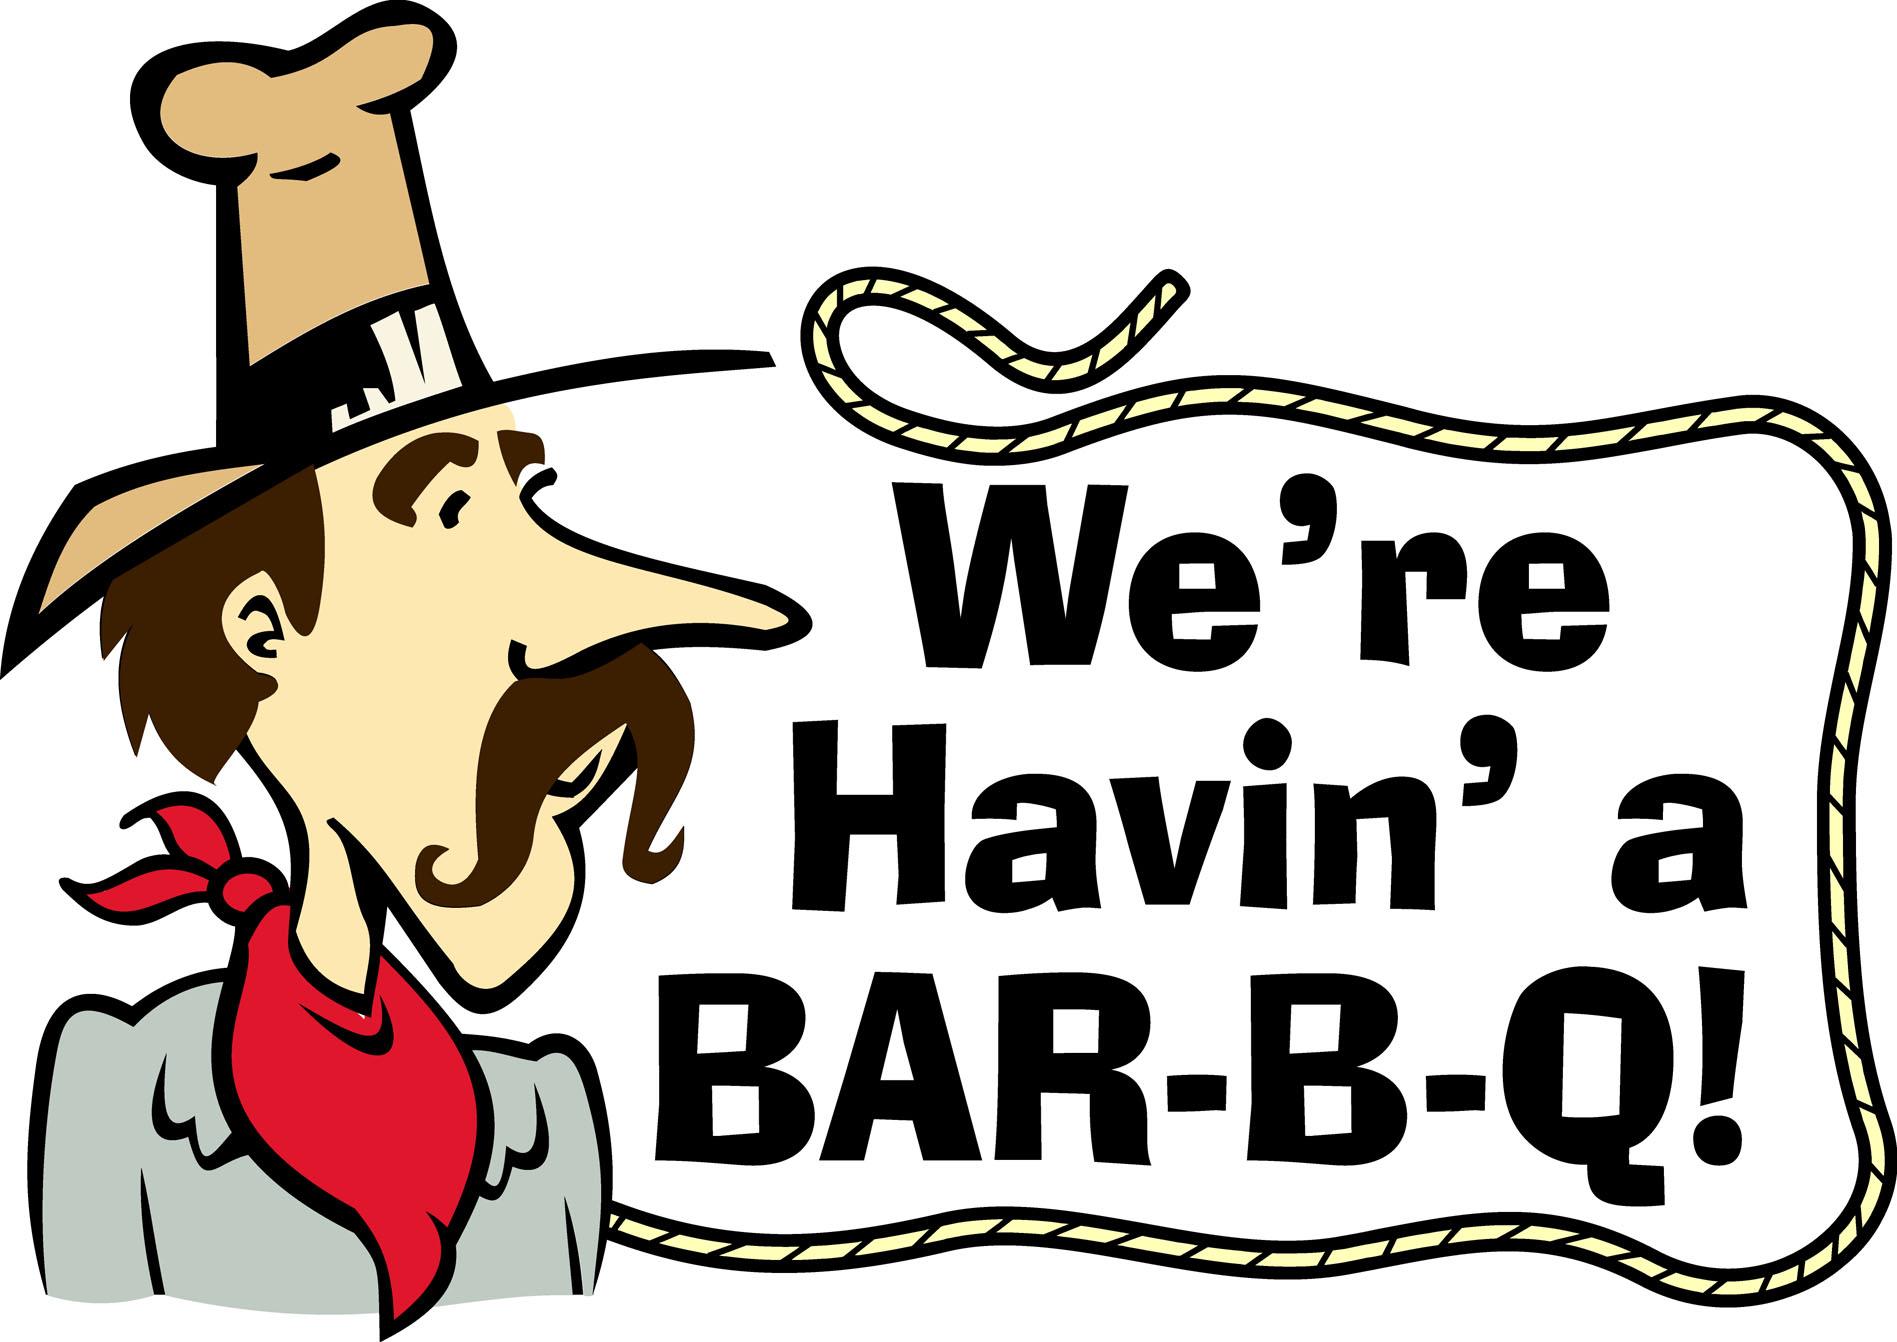 Help bq clipart black and white Stoney Point Lions Club Pork Roast Bar-B-Q black and white